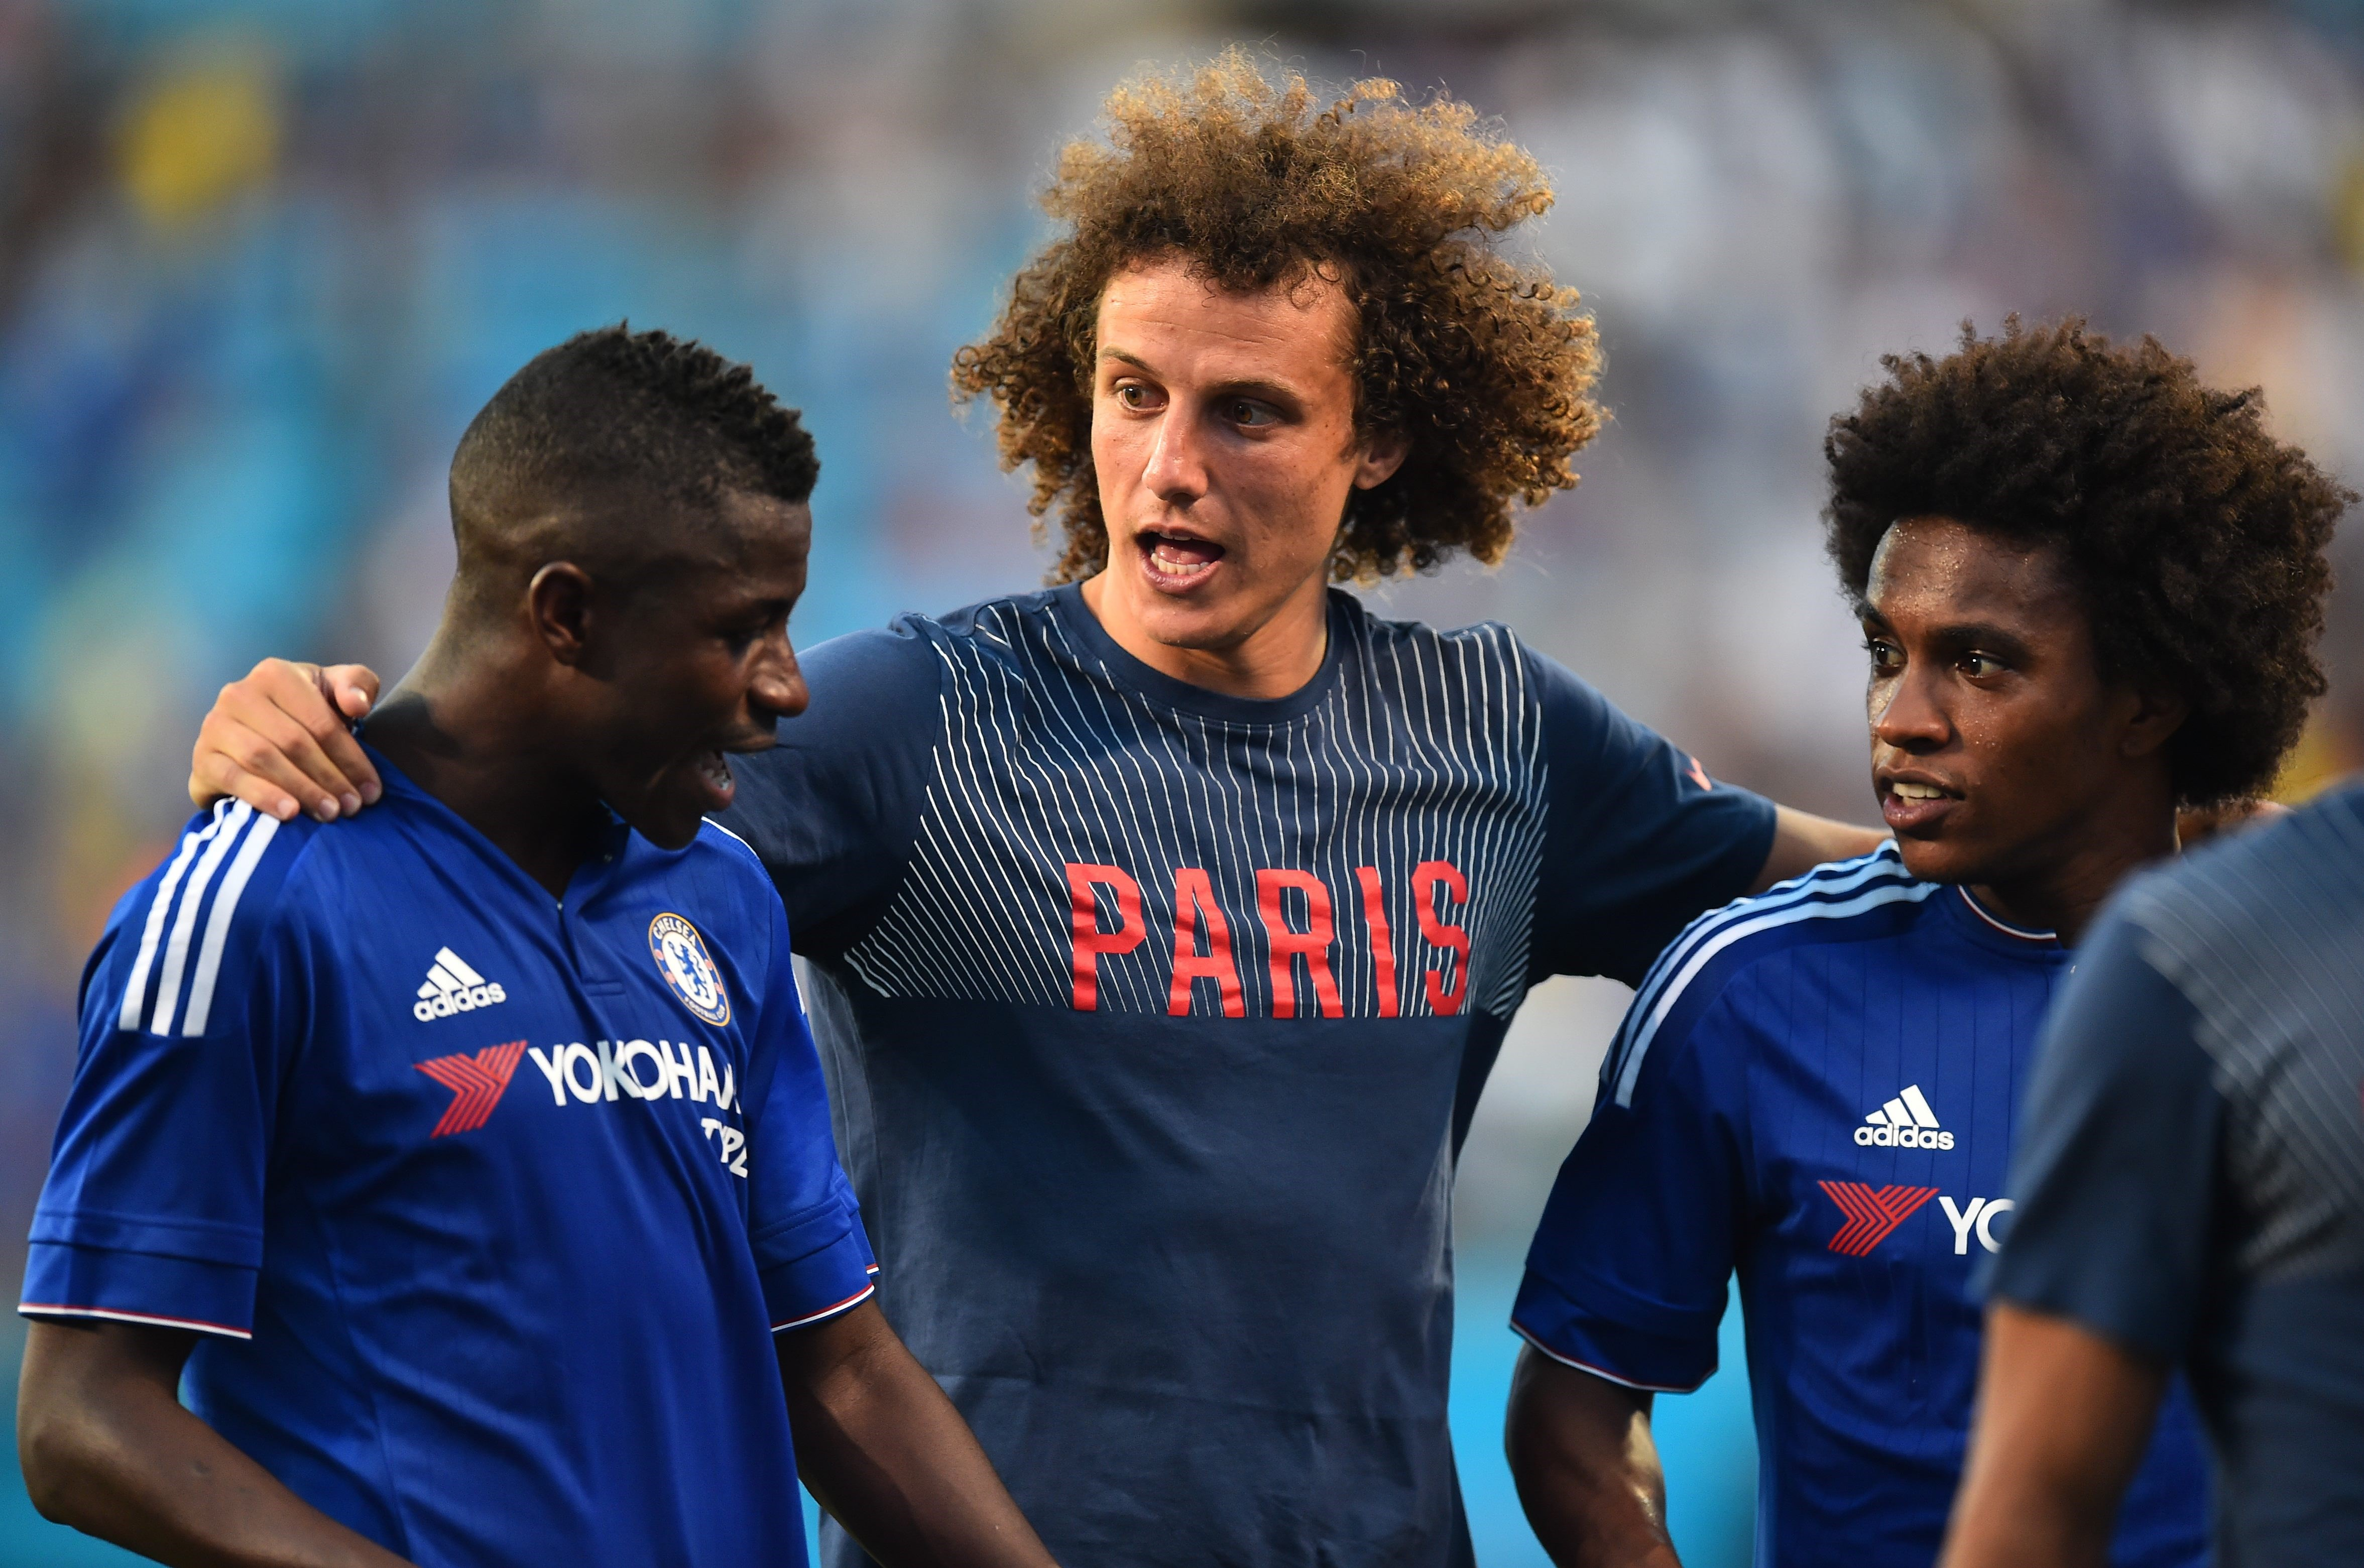 Chelsea's Champions League clash with Paris Saint-Germain will be Jose Mourinho's last chance to save the Blues' season